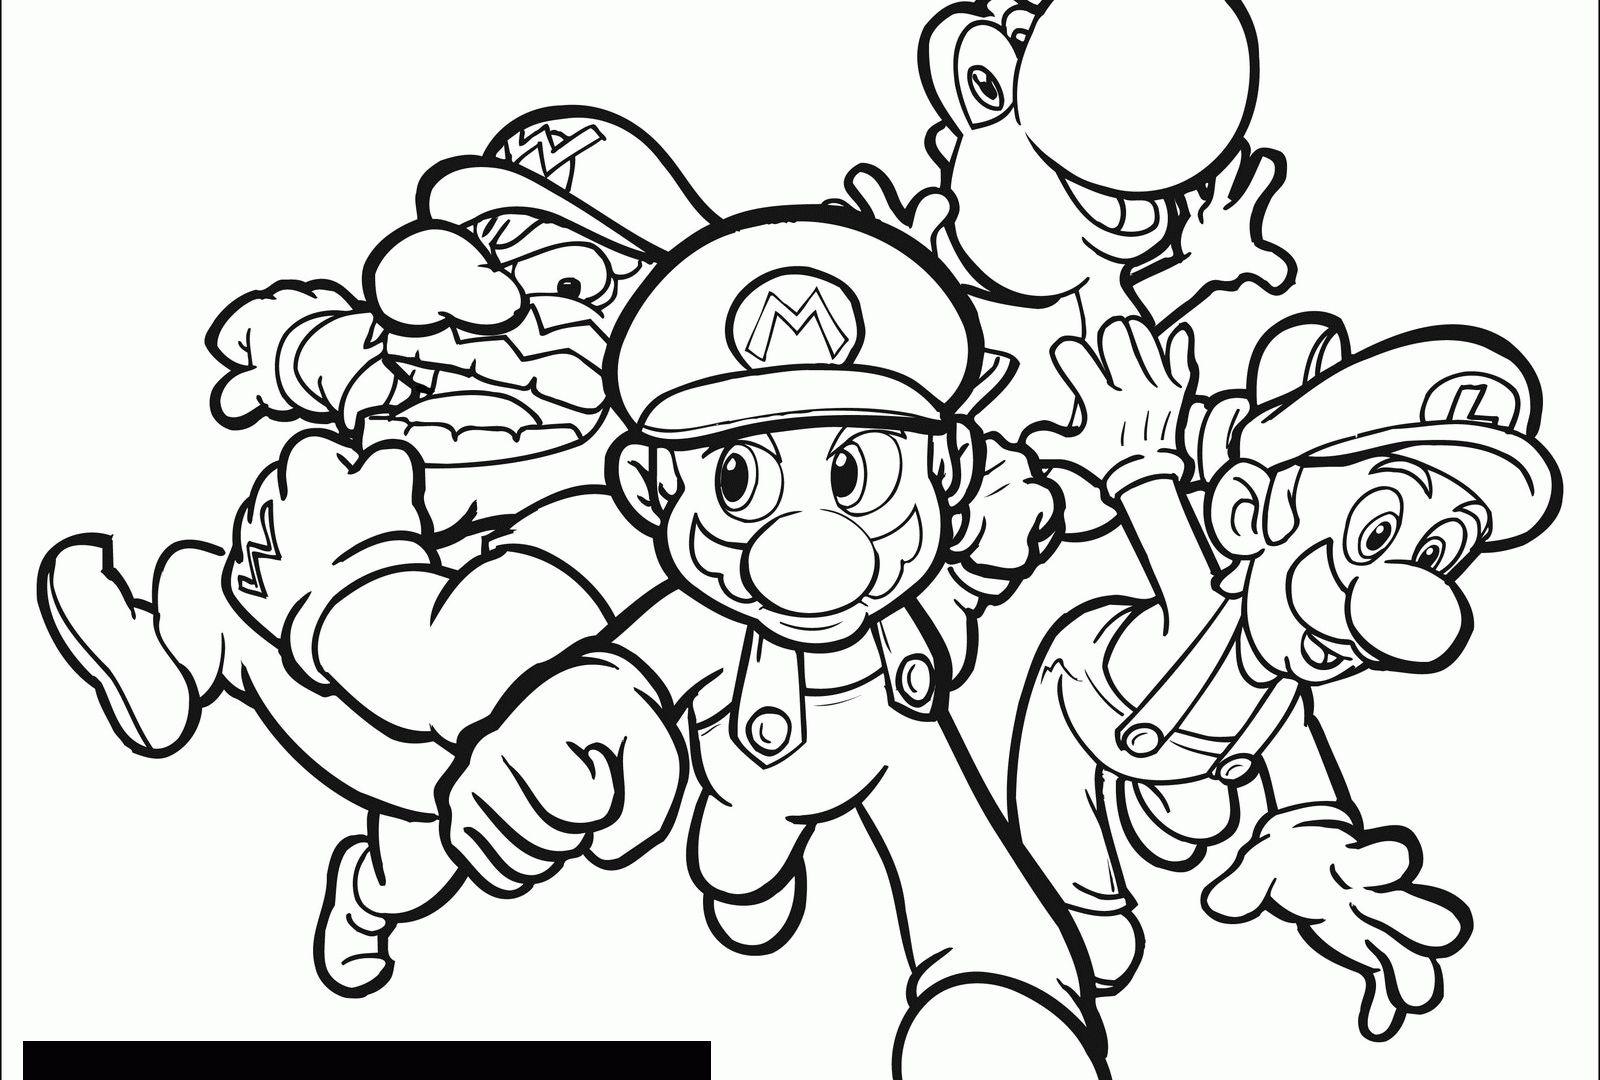 Super Mario Bros Coloring Pages Mariohers Colouring Sheets Bros